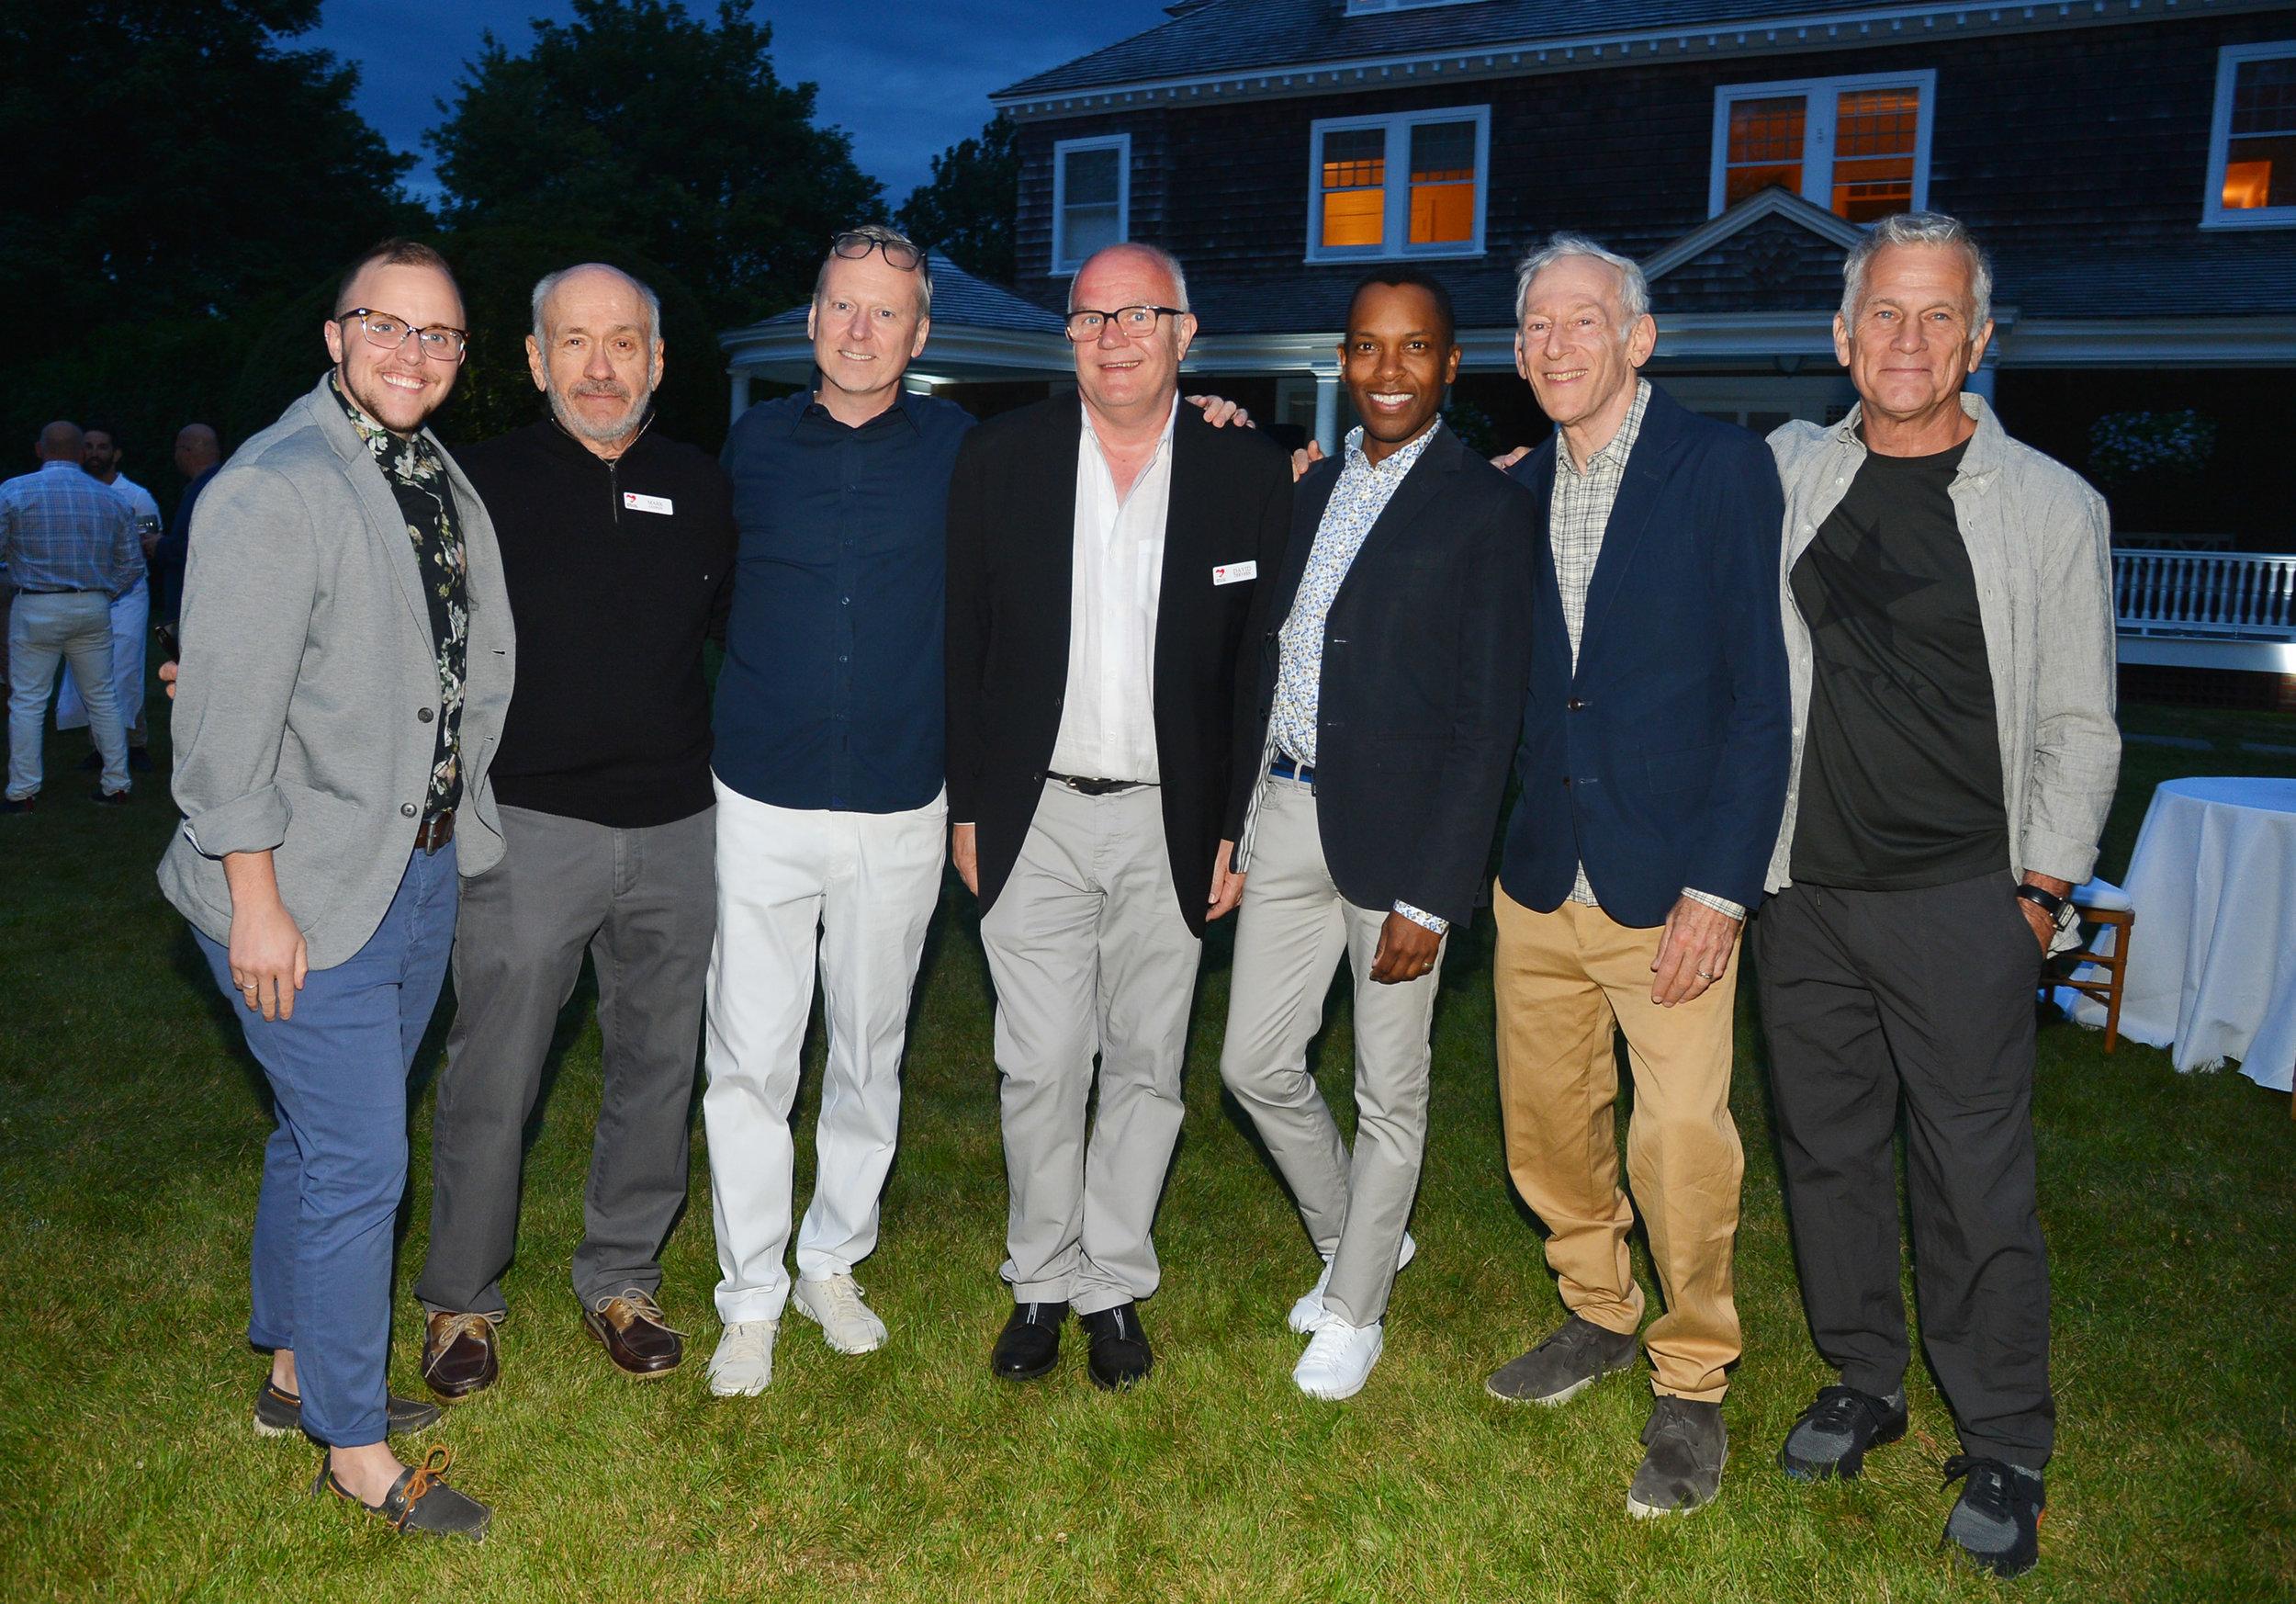 Photo by Patrick McMullan - mSd 2019 - Emmett Findley, Mark Lehrer, David Ludwigson, David Terveen, LaMont Craig, Jon Gilman, Brad Learmonth.jpg